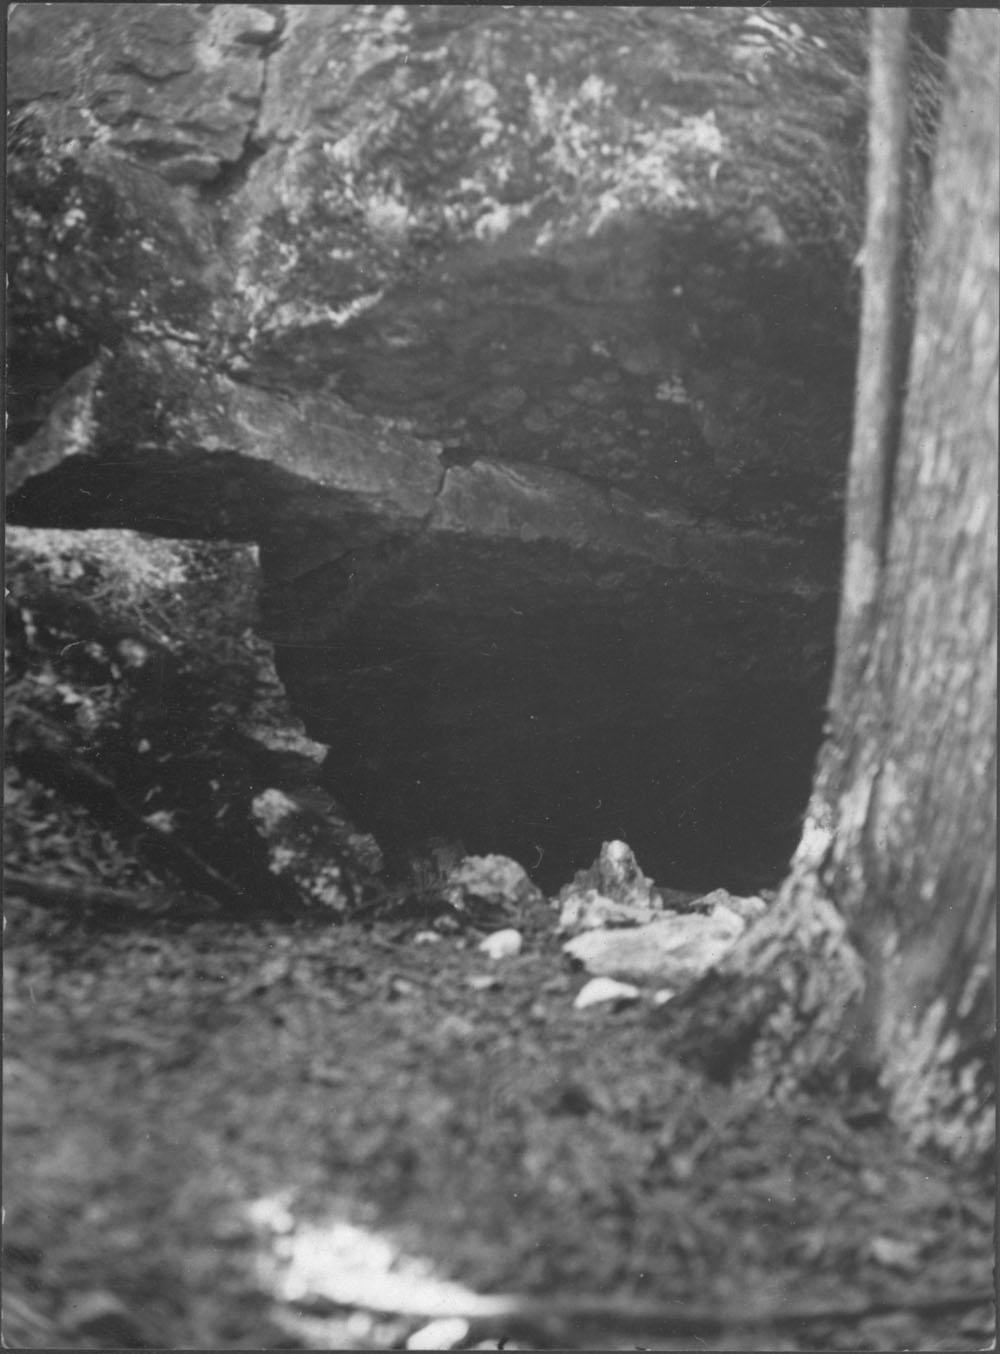 CaveSkeletons_archiveCanada.jpg